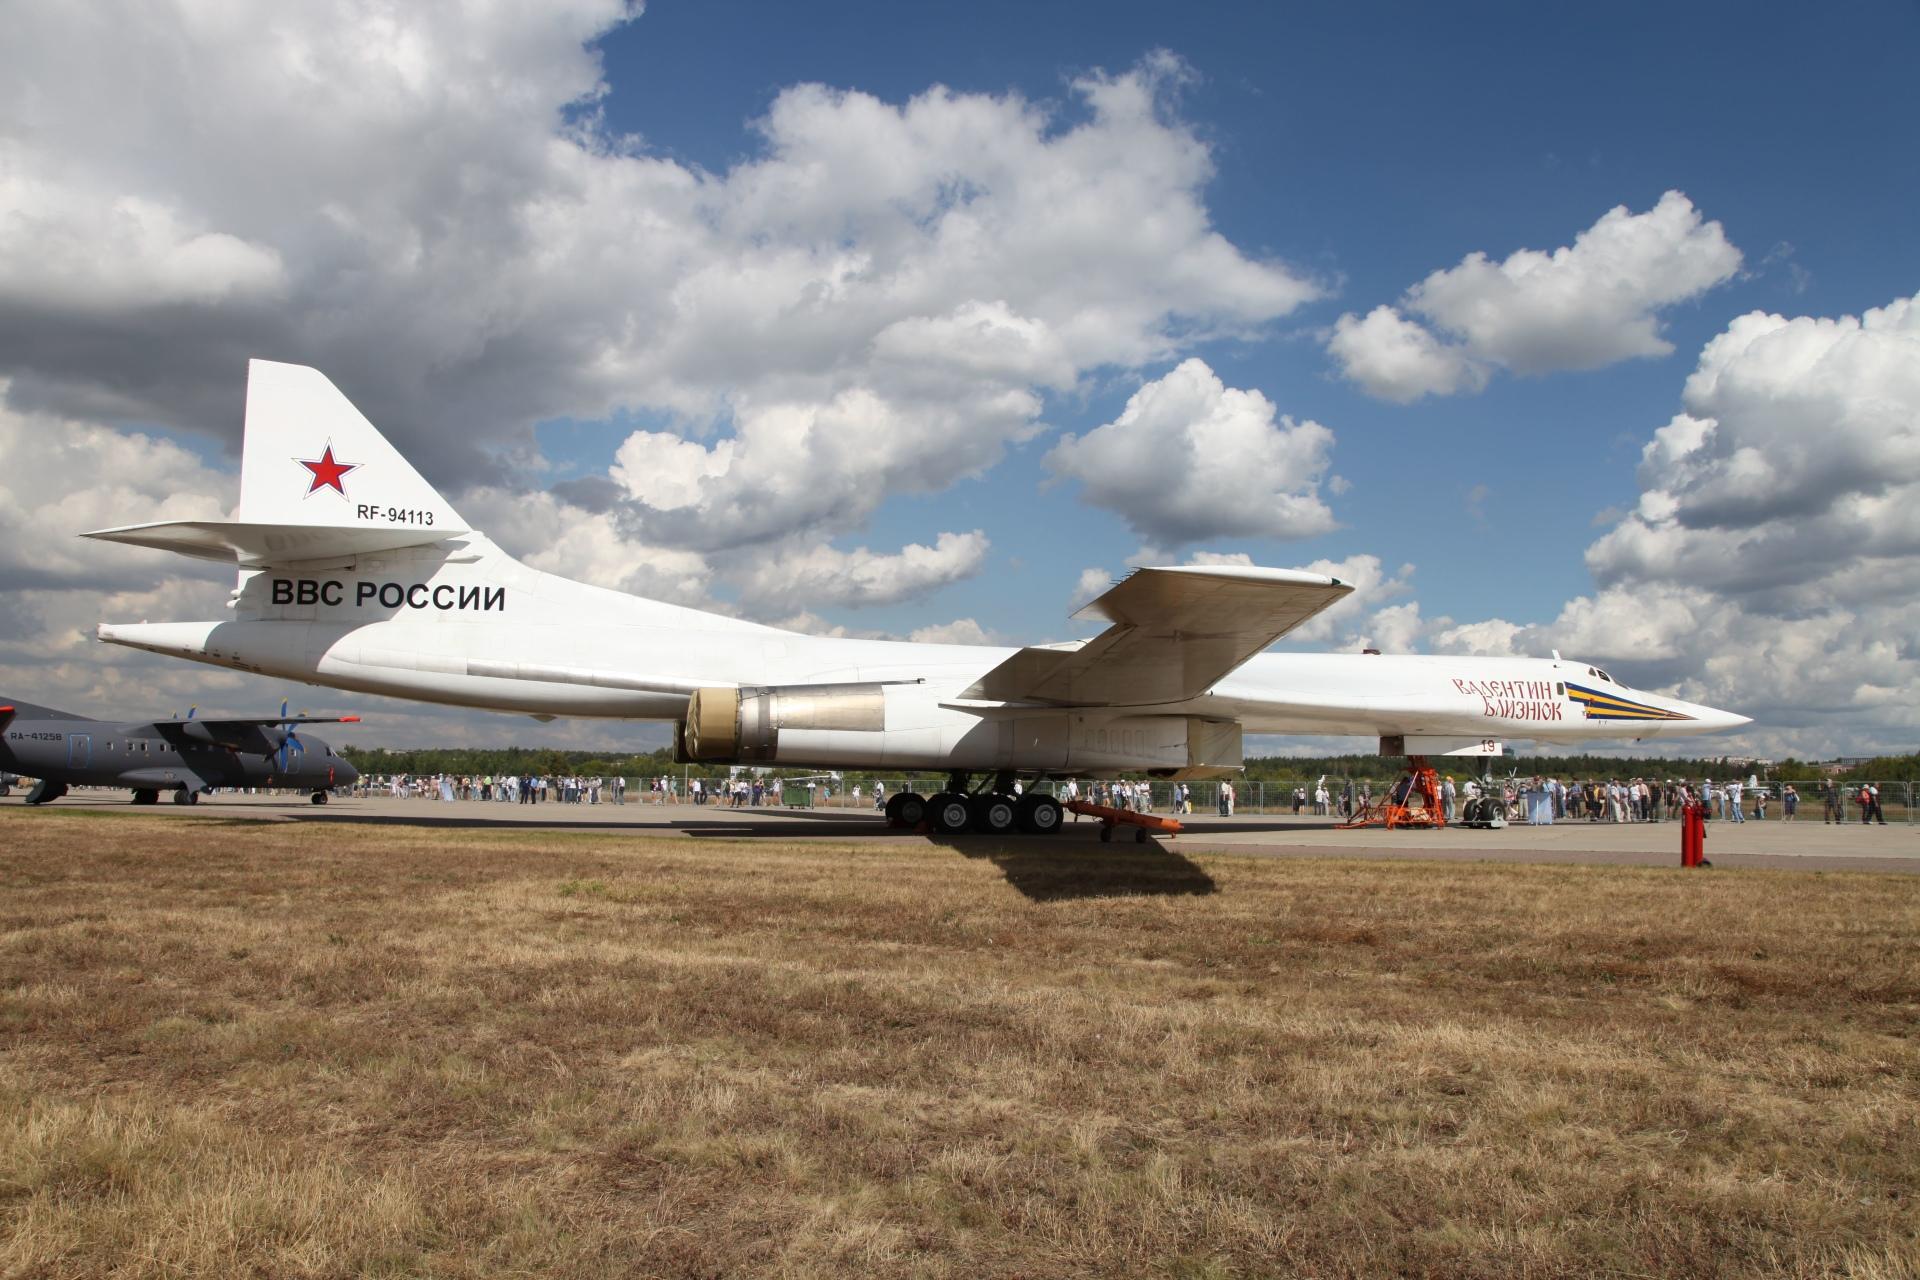 Tupolev Tu-160 wallpapers HD quality